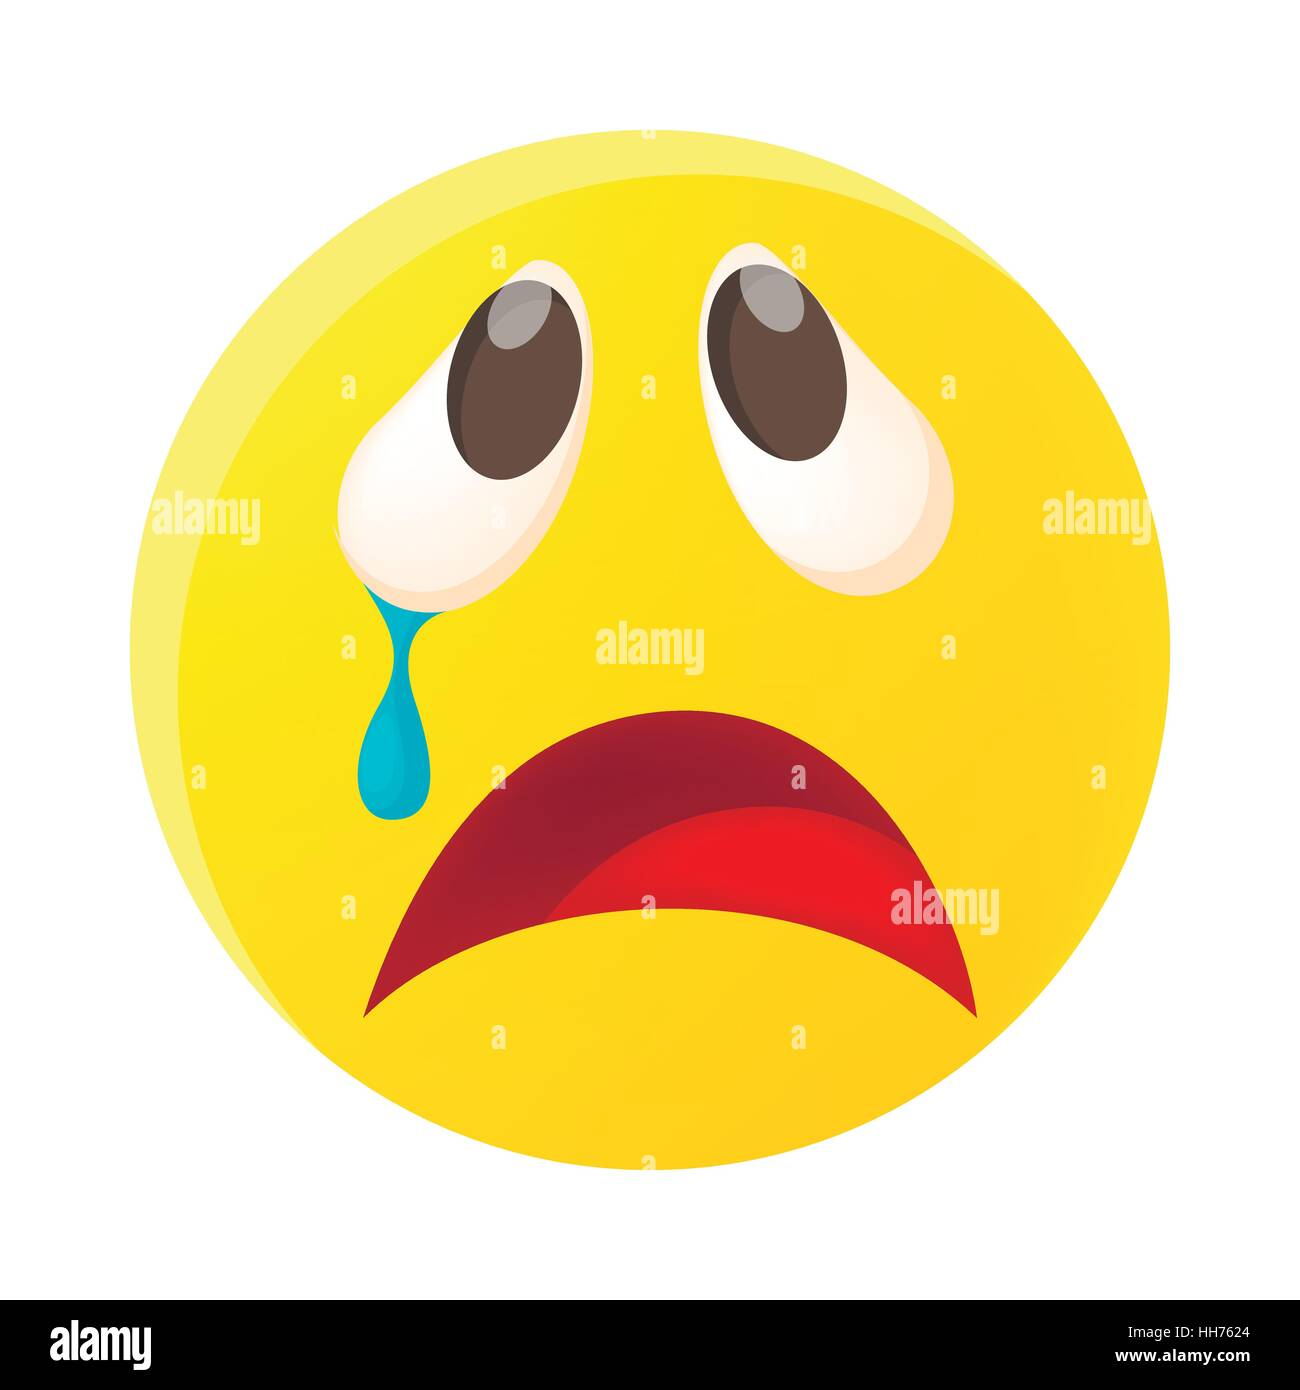 crying face emoticon with tear icon cartoon style stock vector art rh alamy com cartoon picture crying face cartoon crying face free download